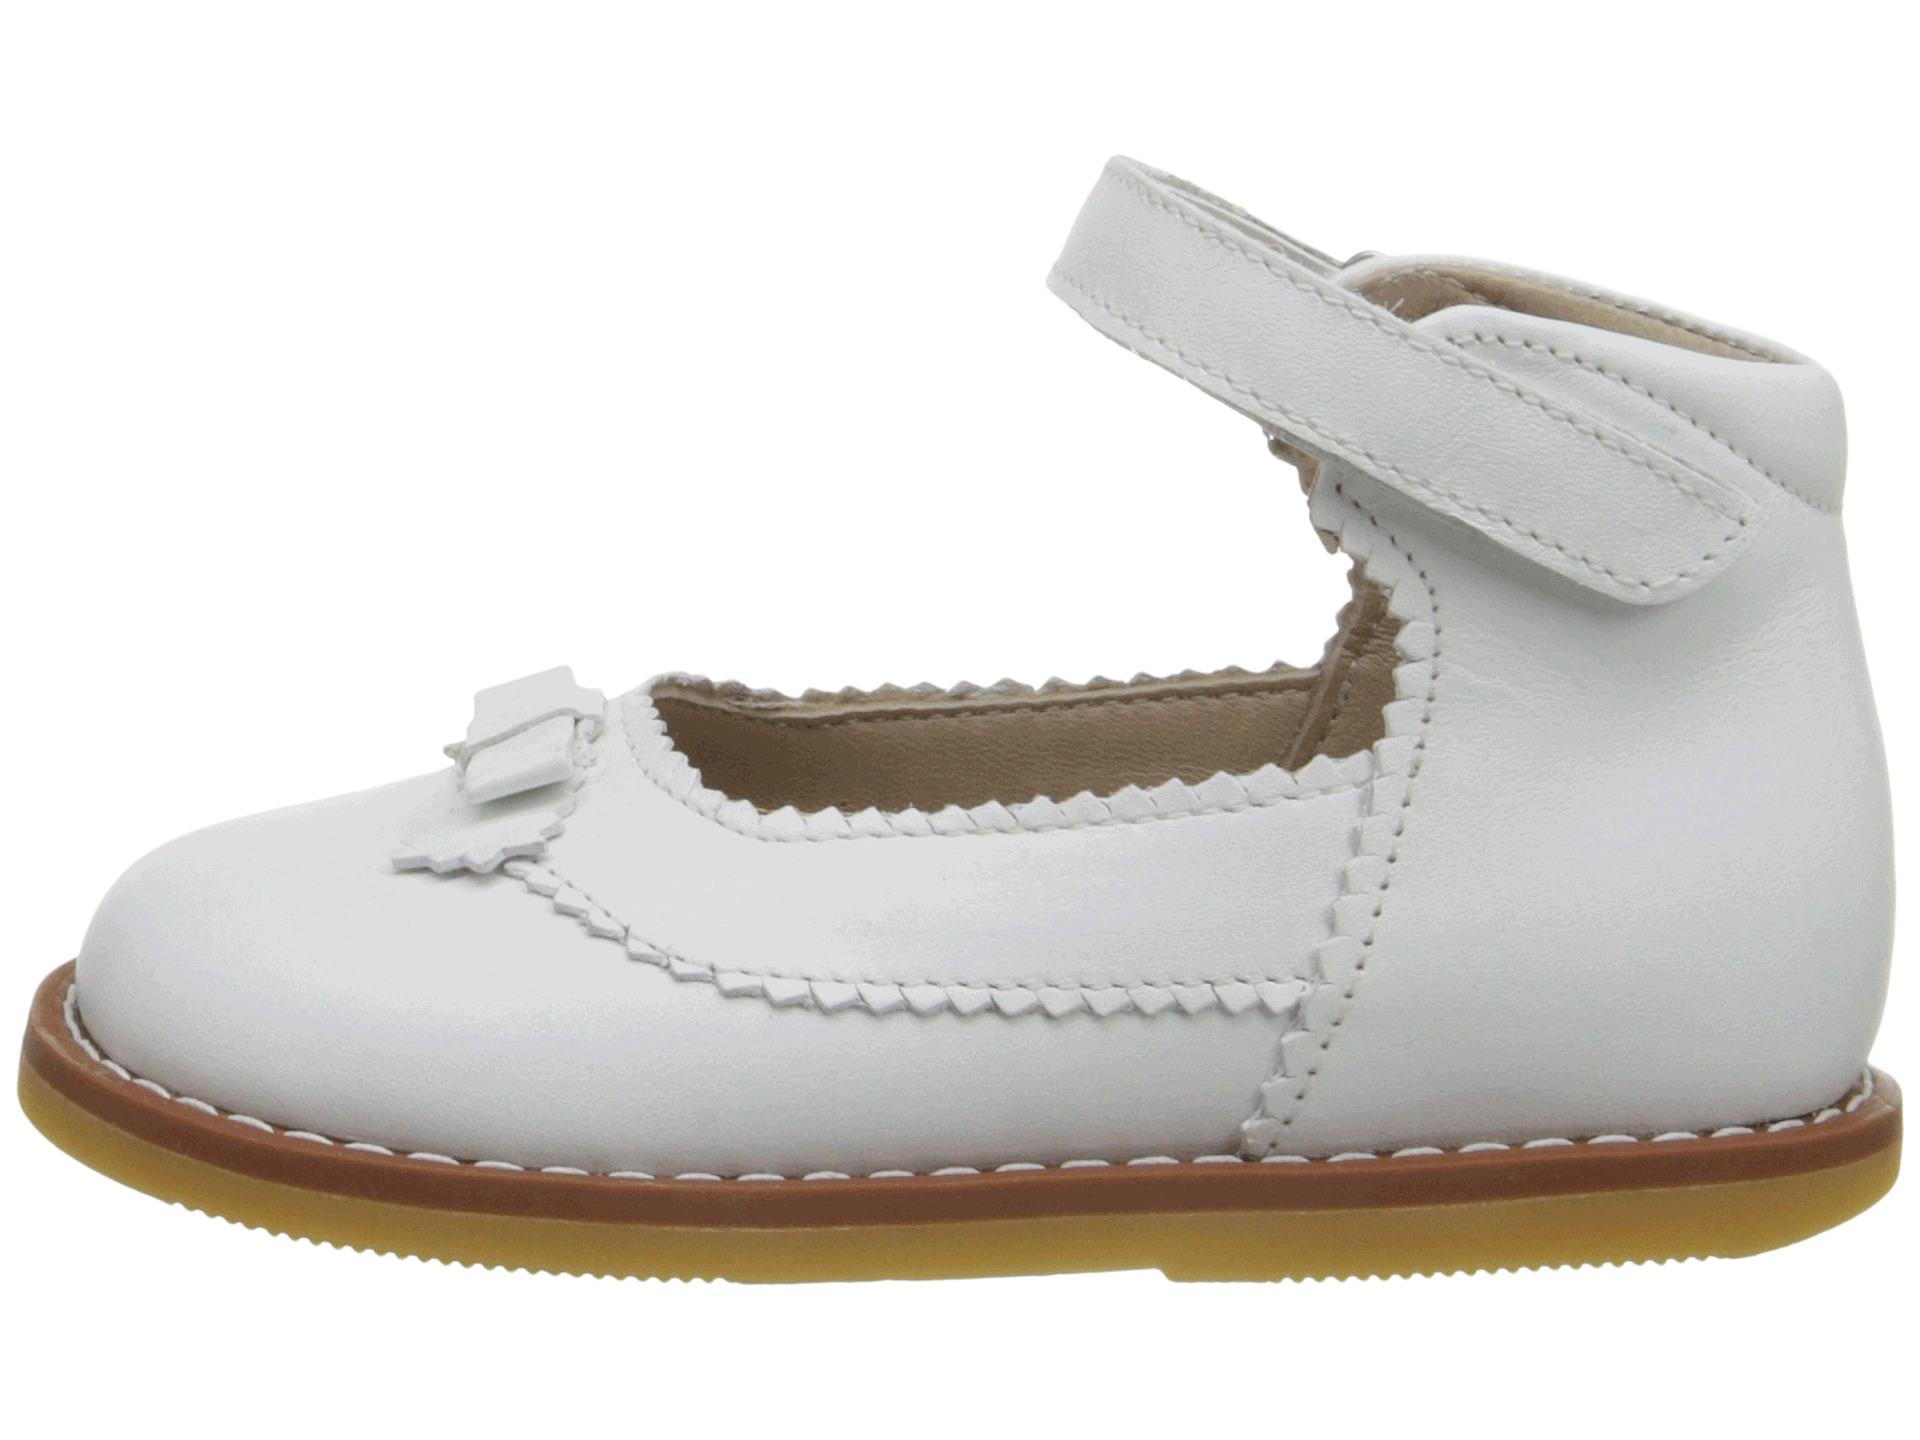 Elephantito White Shoes